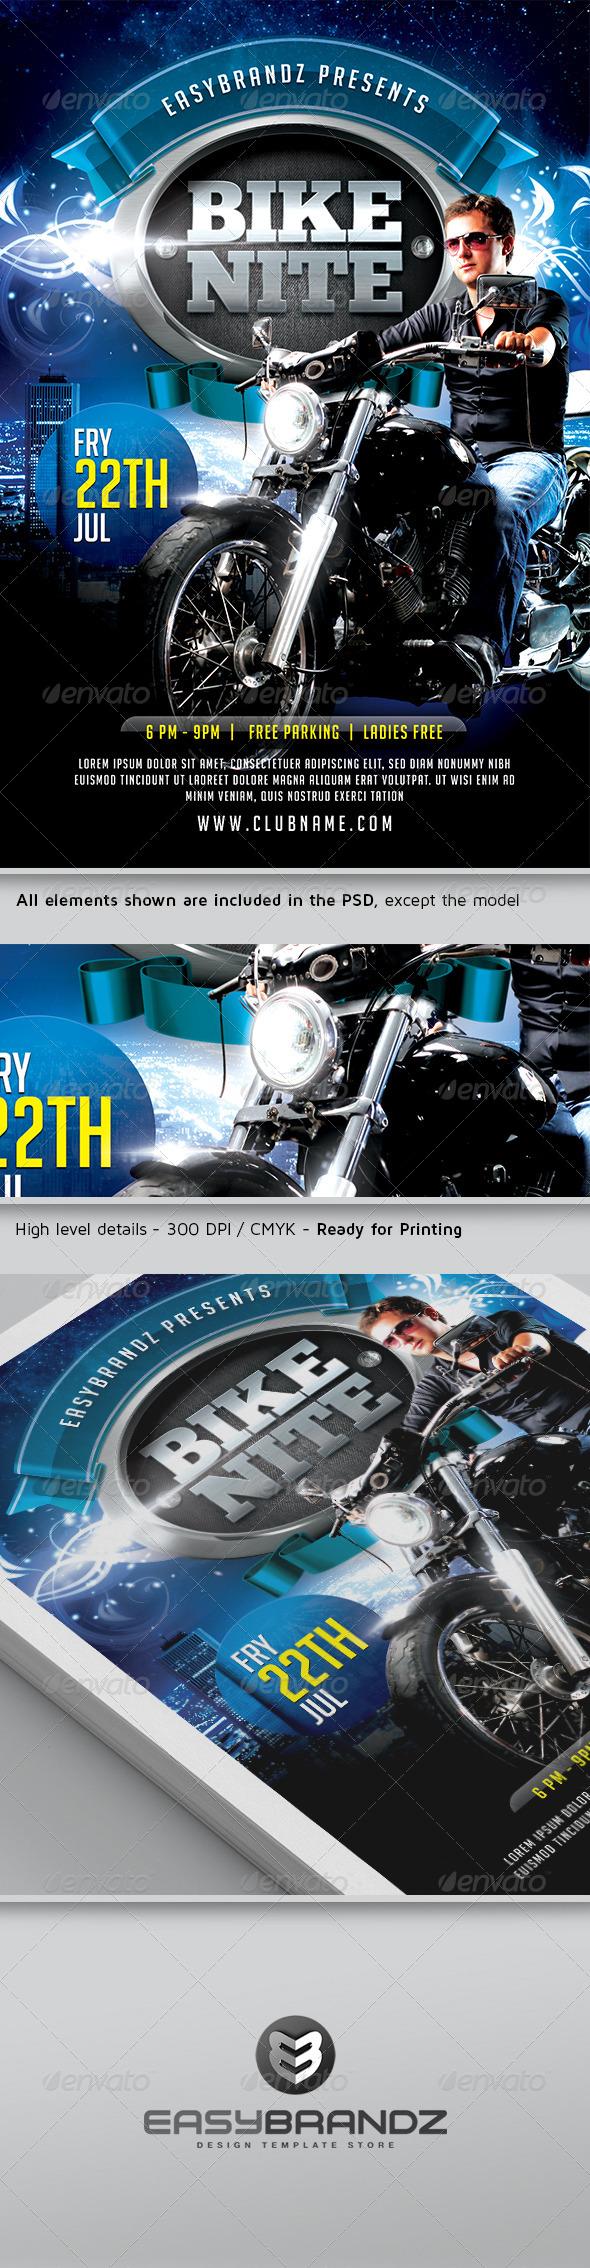 GraphicRiver Bike Nite Flyer Template 5012425